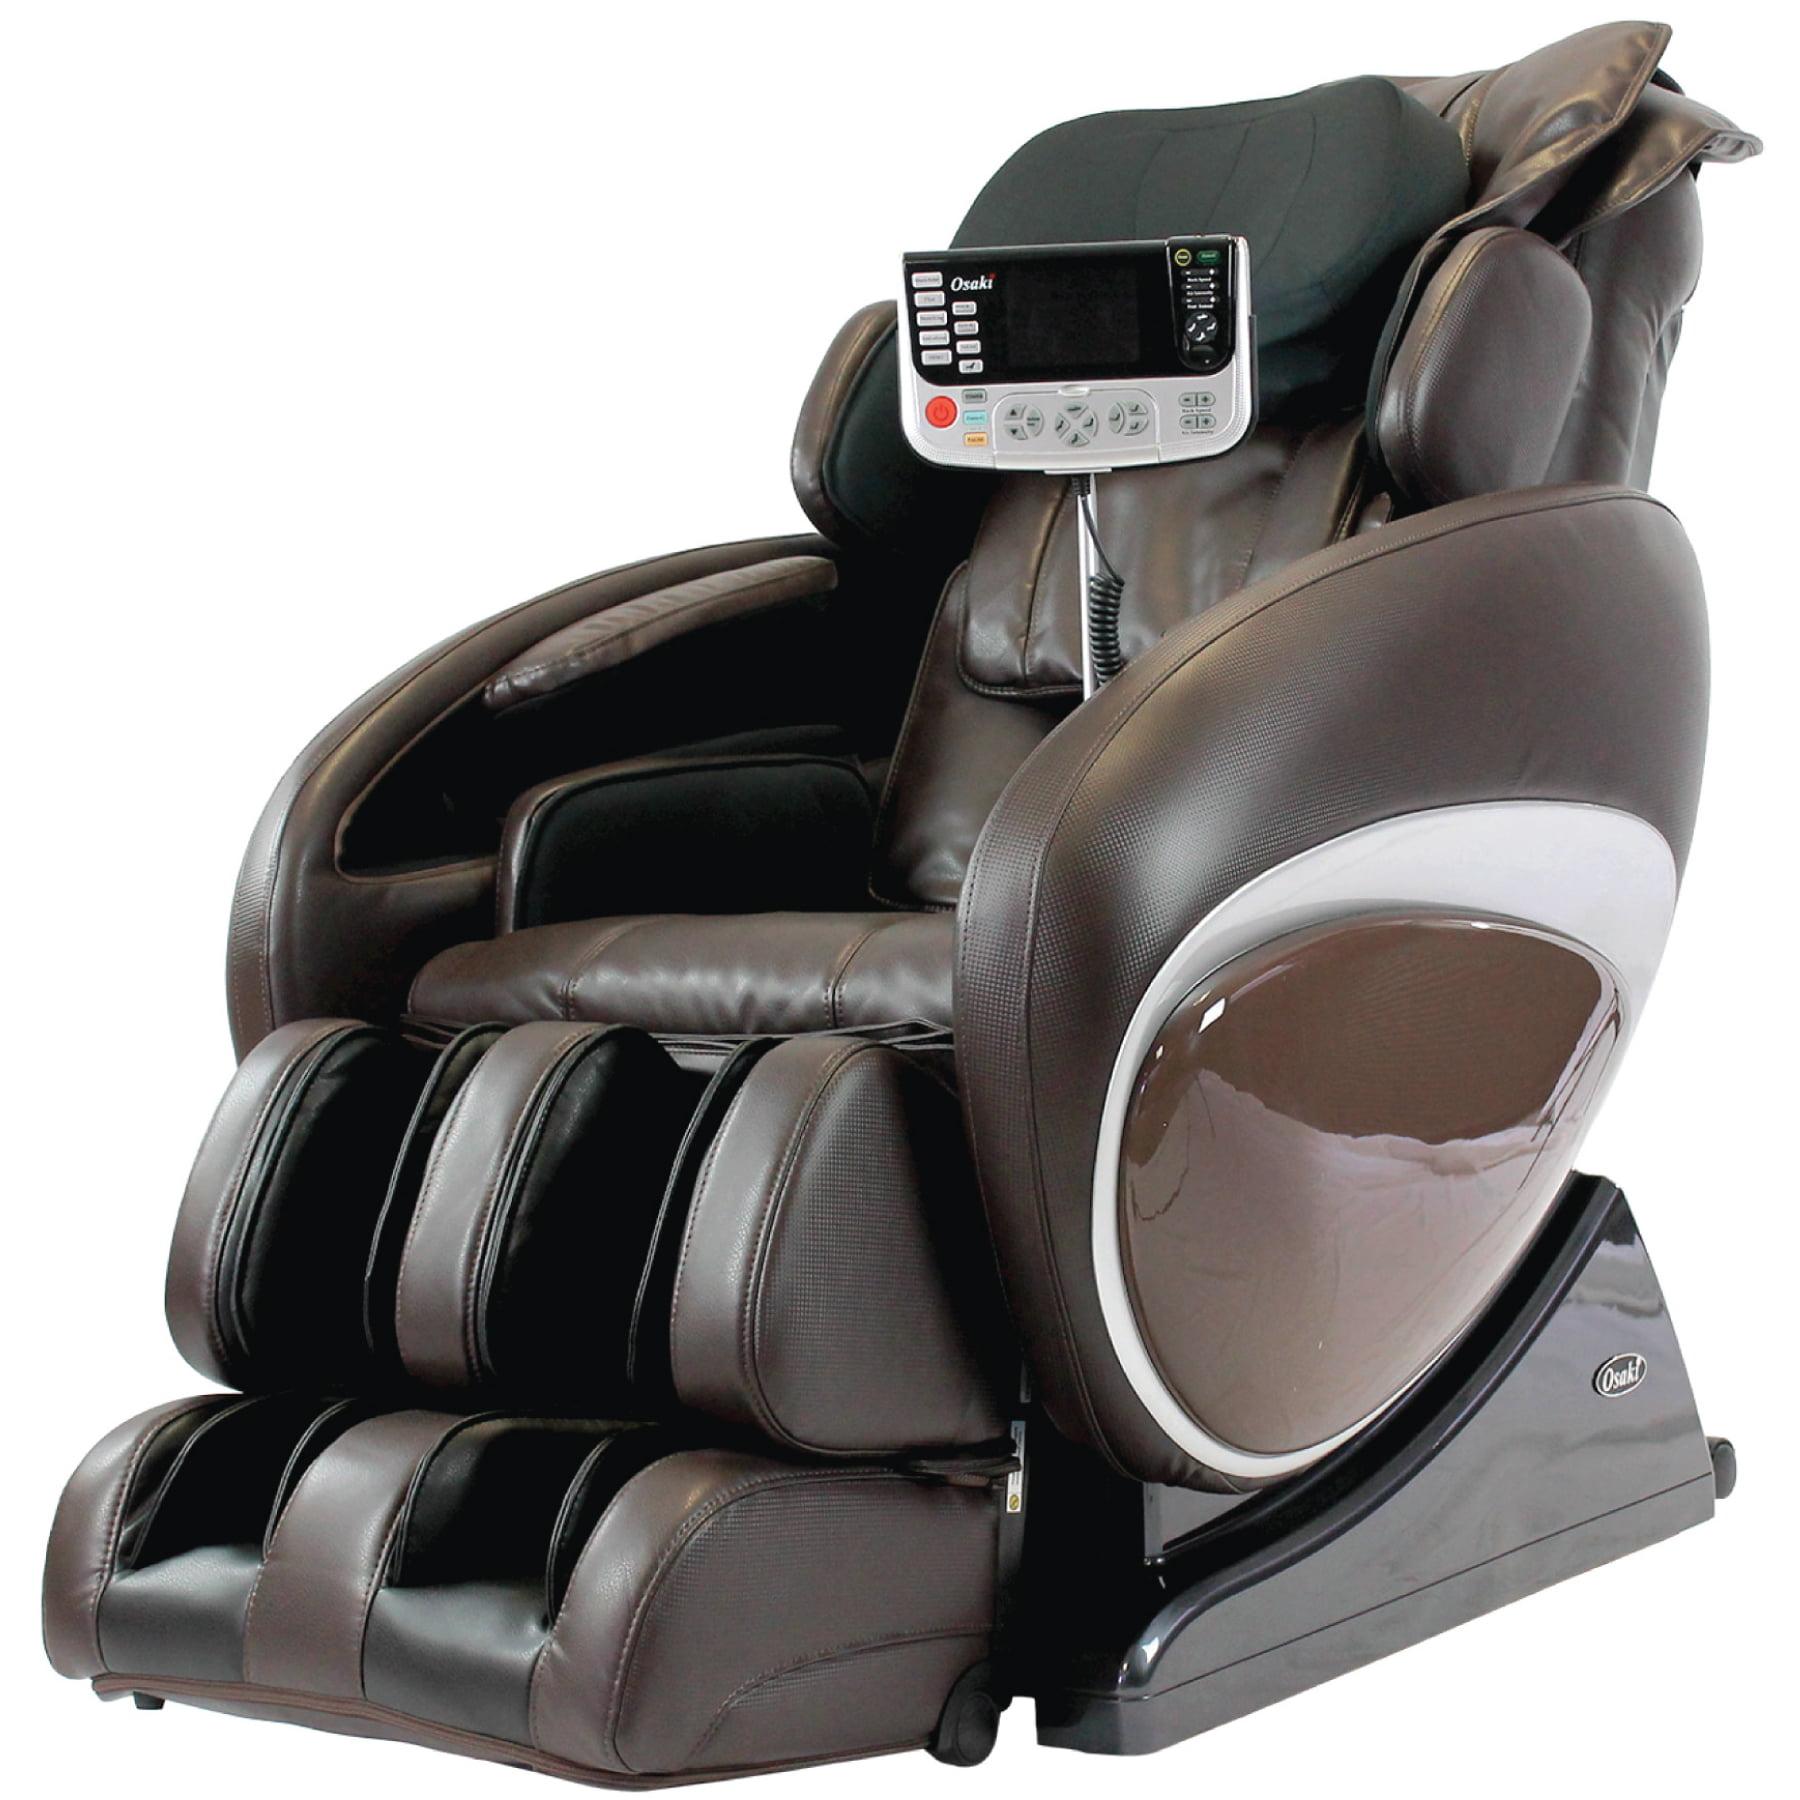 Osaki OS-4000T Zero Gravity Massage Chair, Brown, Computer Body Scan, Zero Gravity Design, Unique Foot Roller, Next Generation Air Massage Technology, Arm Air Massagers, Auto Recline and Leg Extension